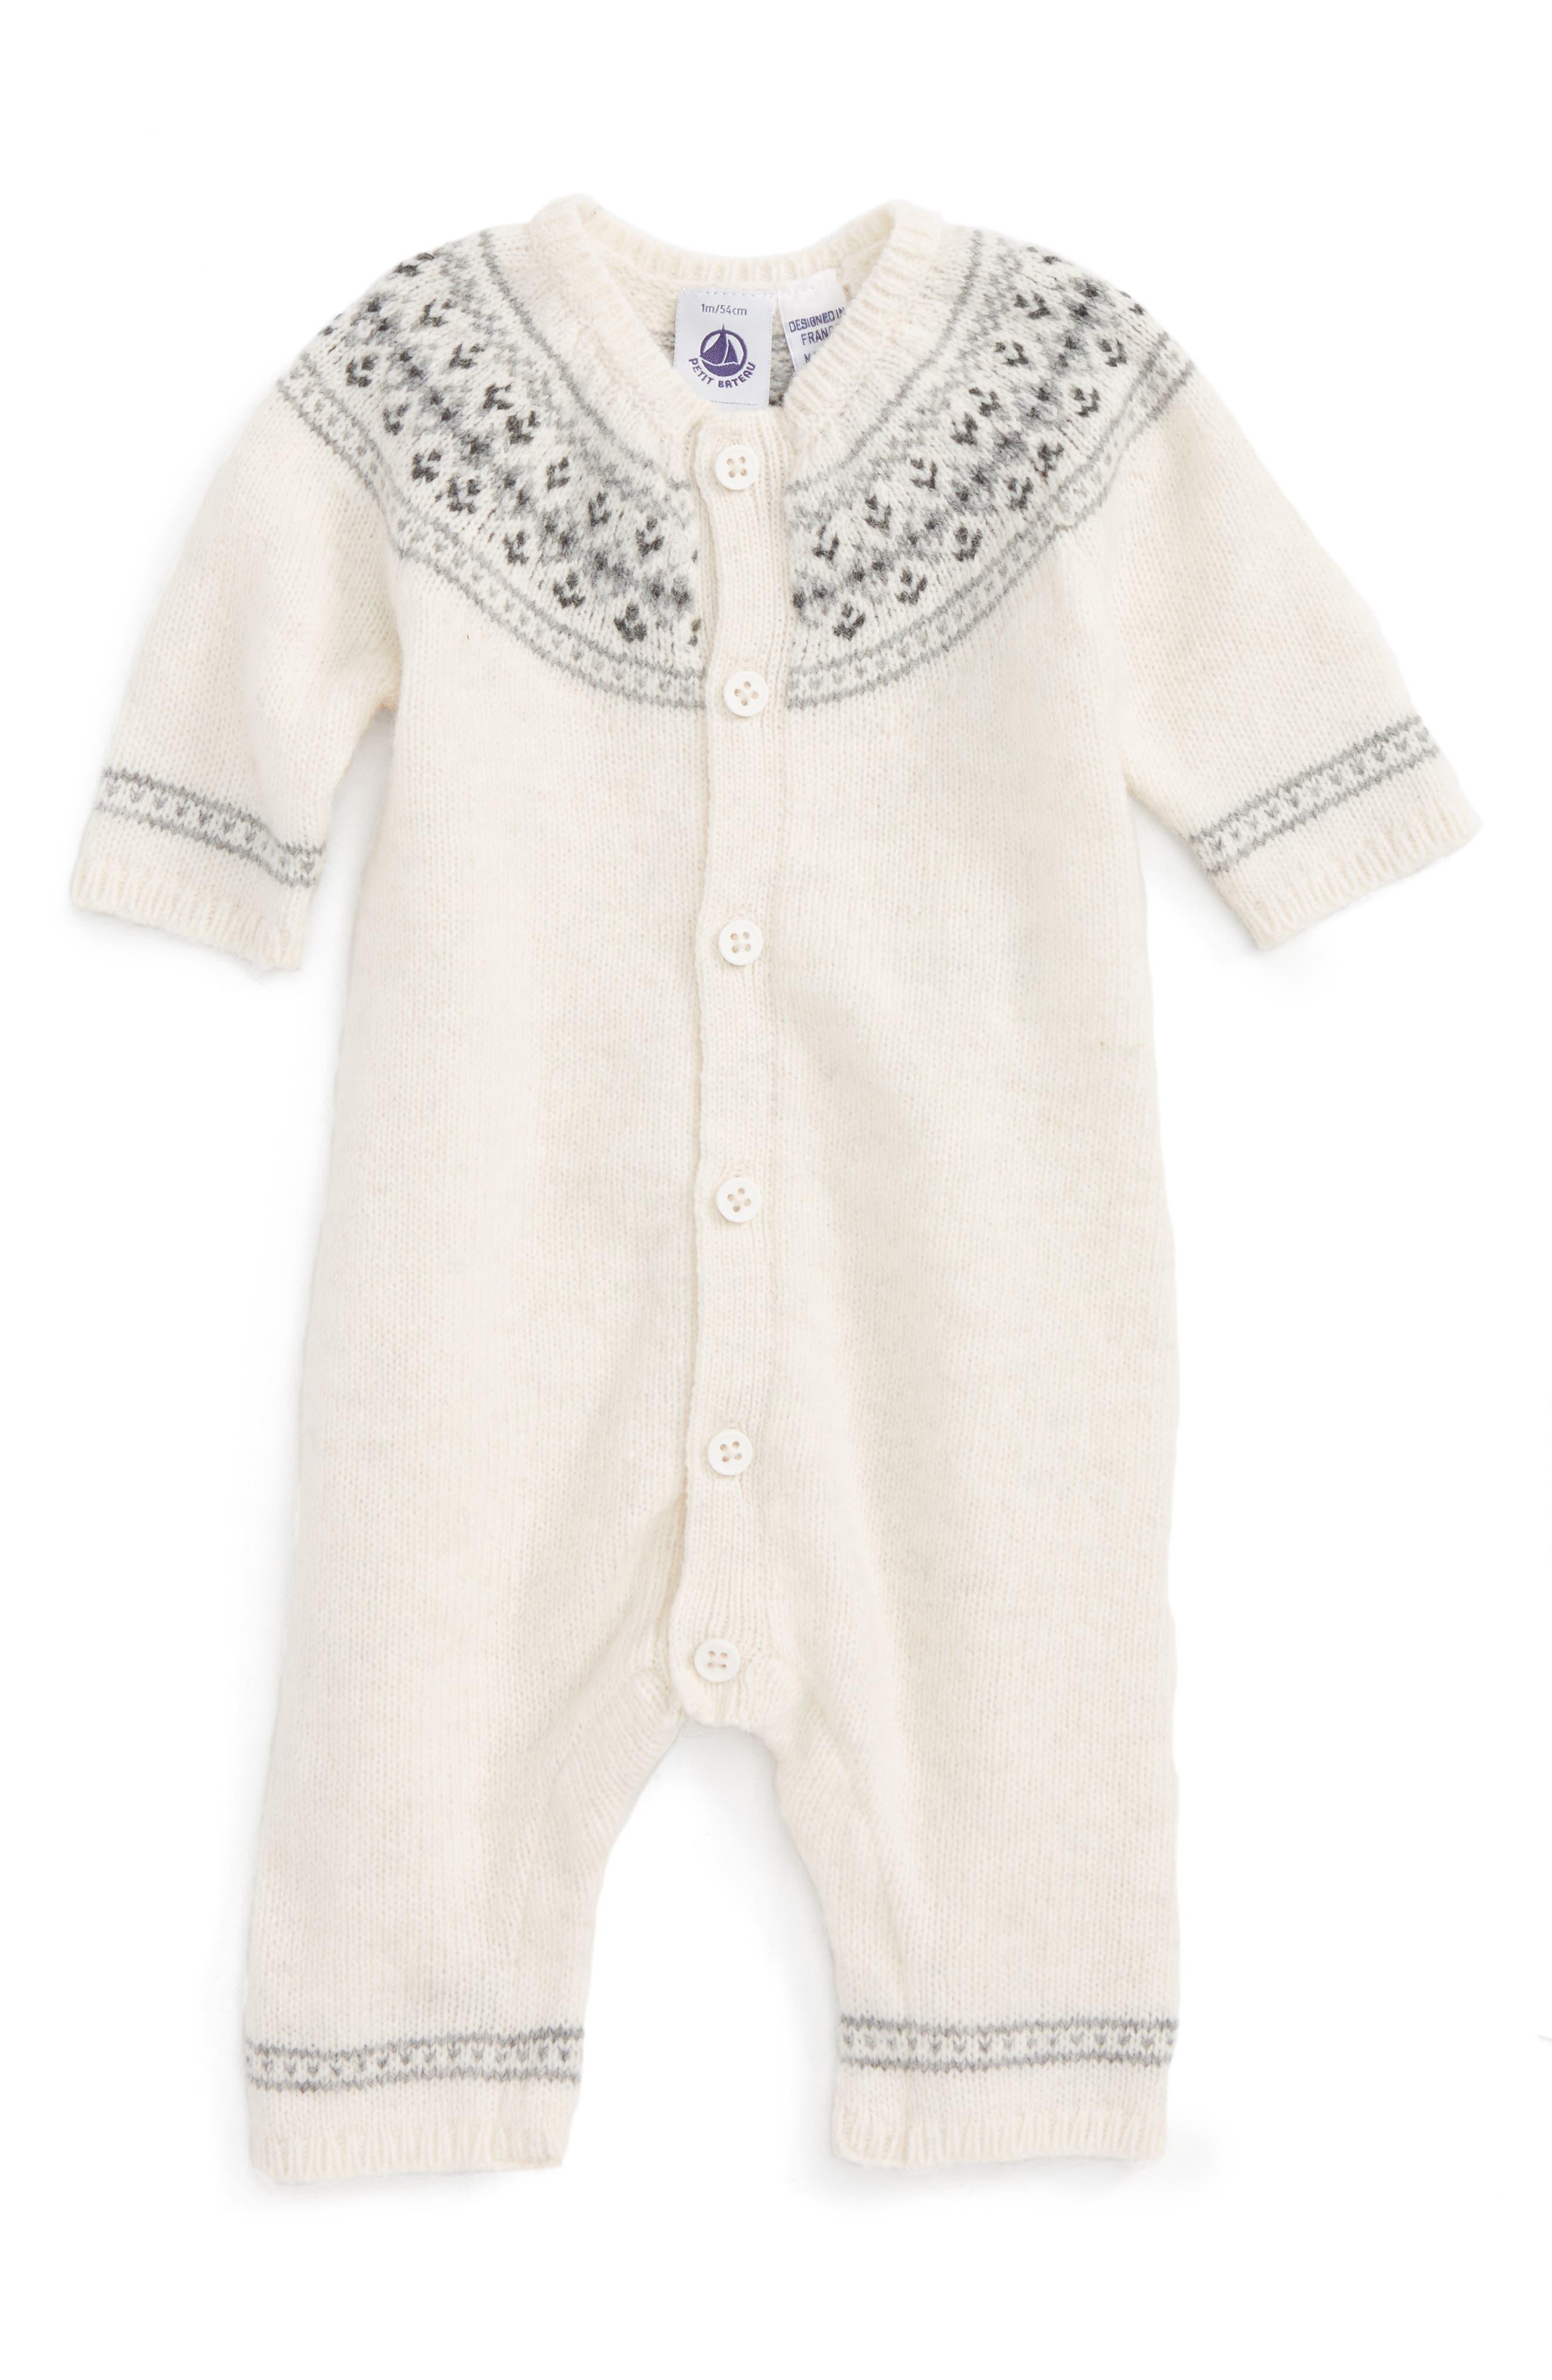 Petit Bateau Knit Romper (Baby)